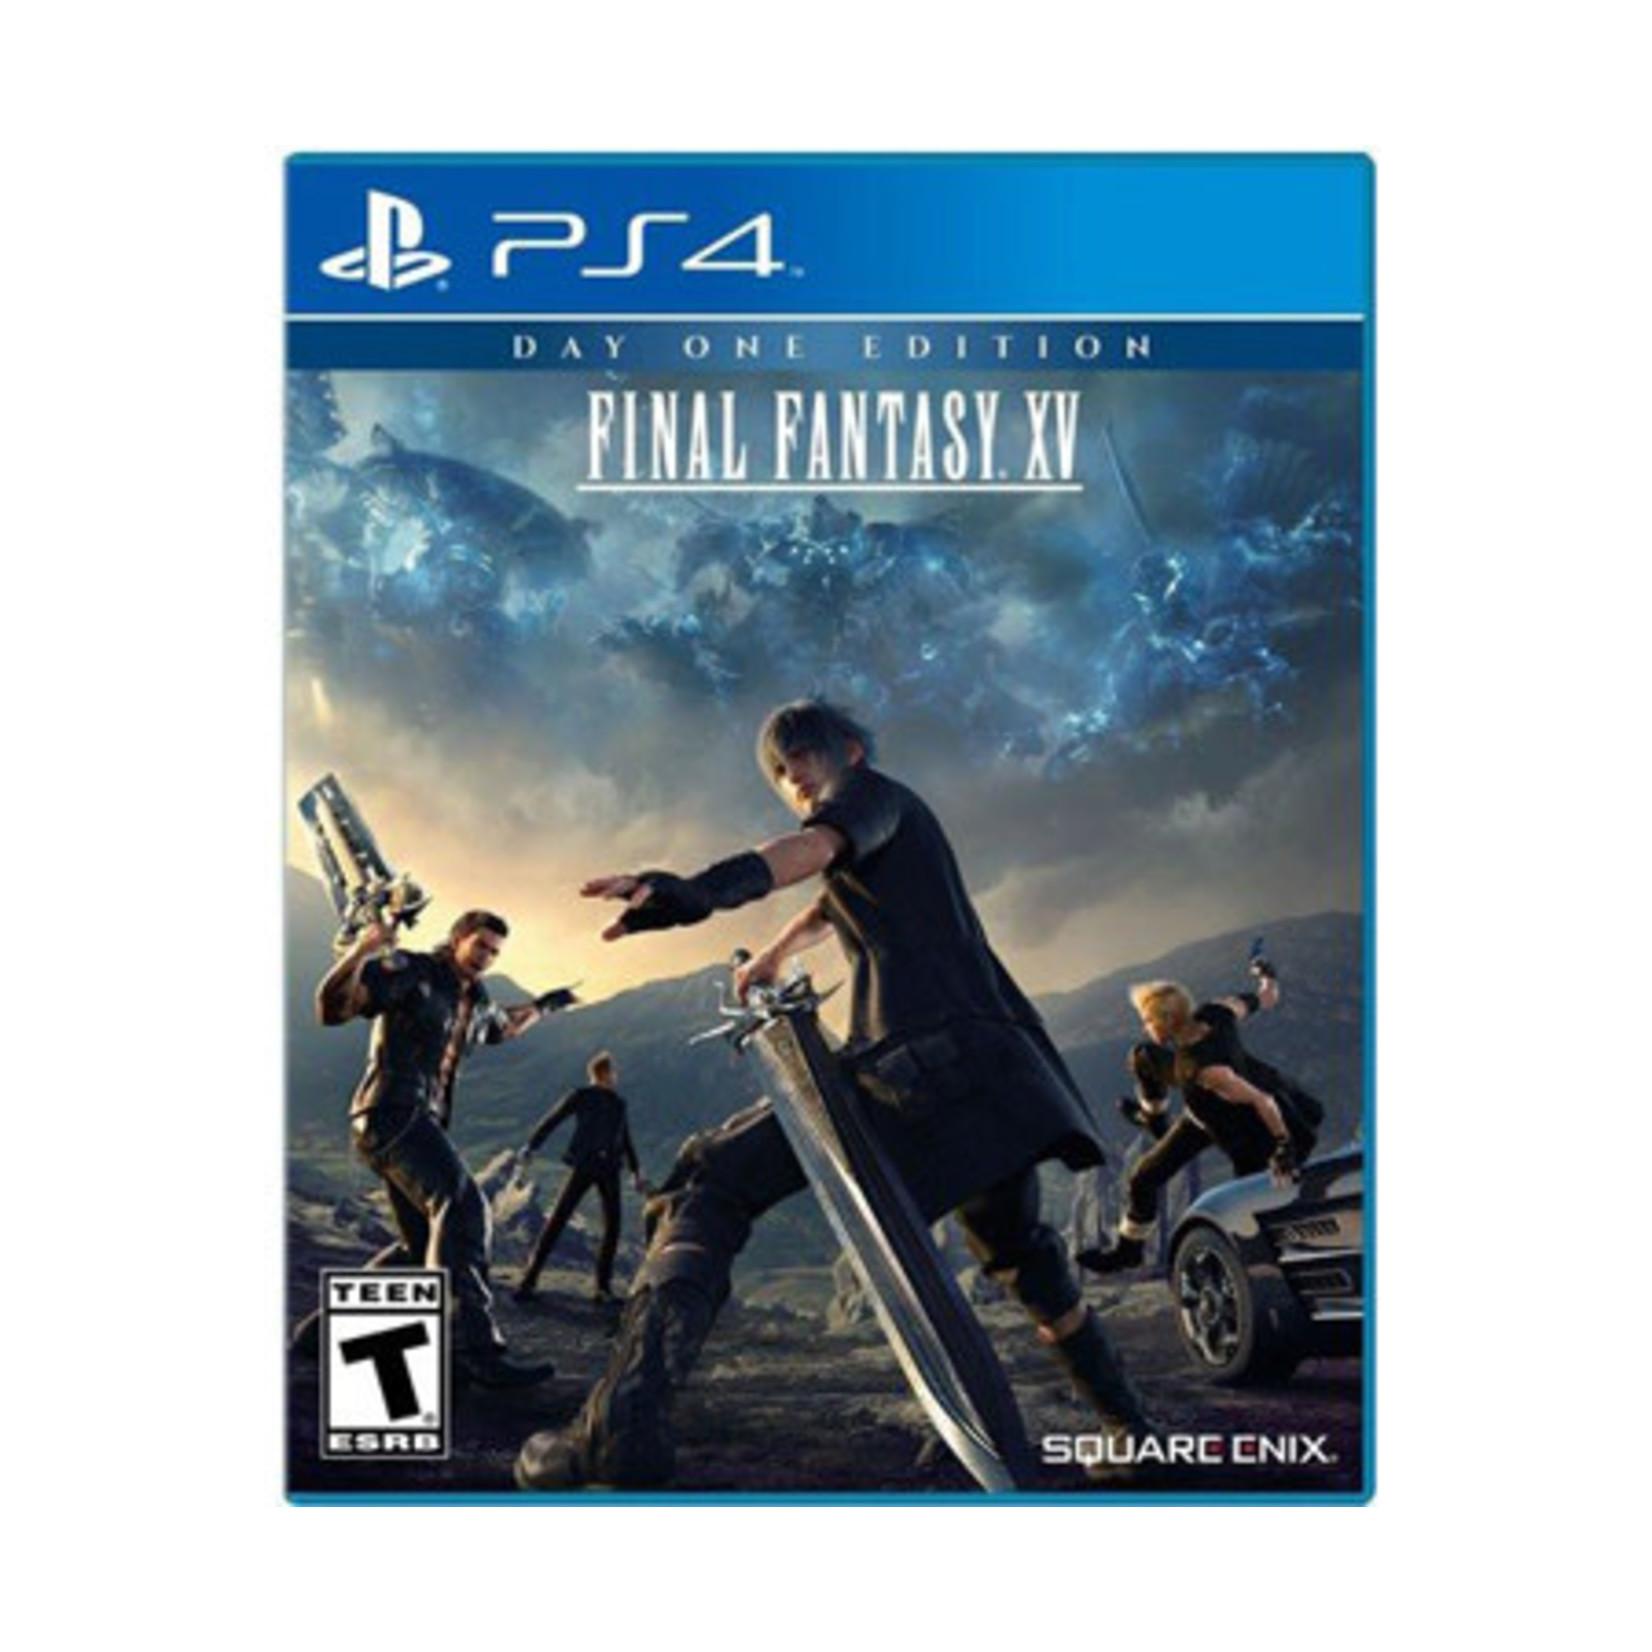 PS4U-Final Fantasy XV